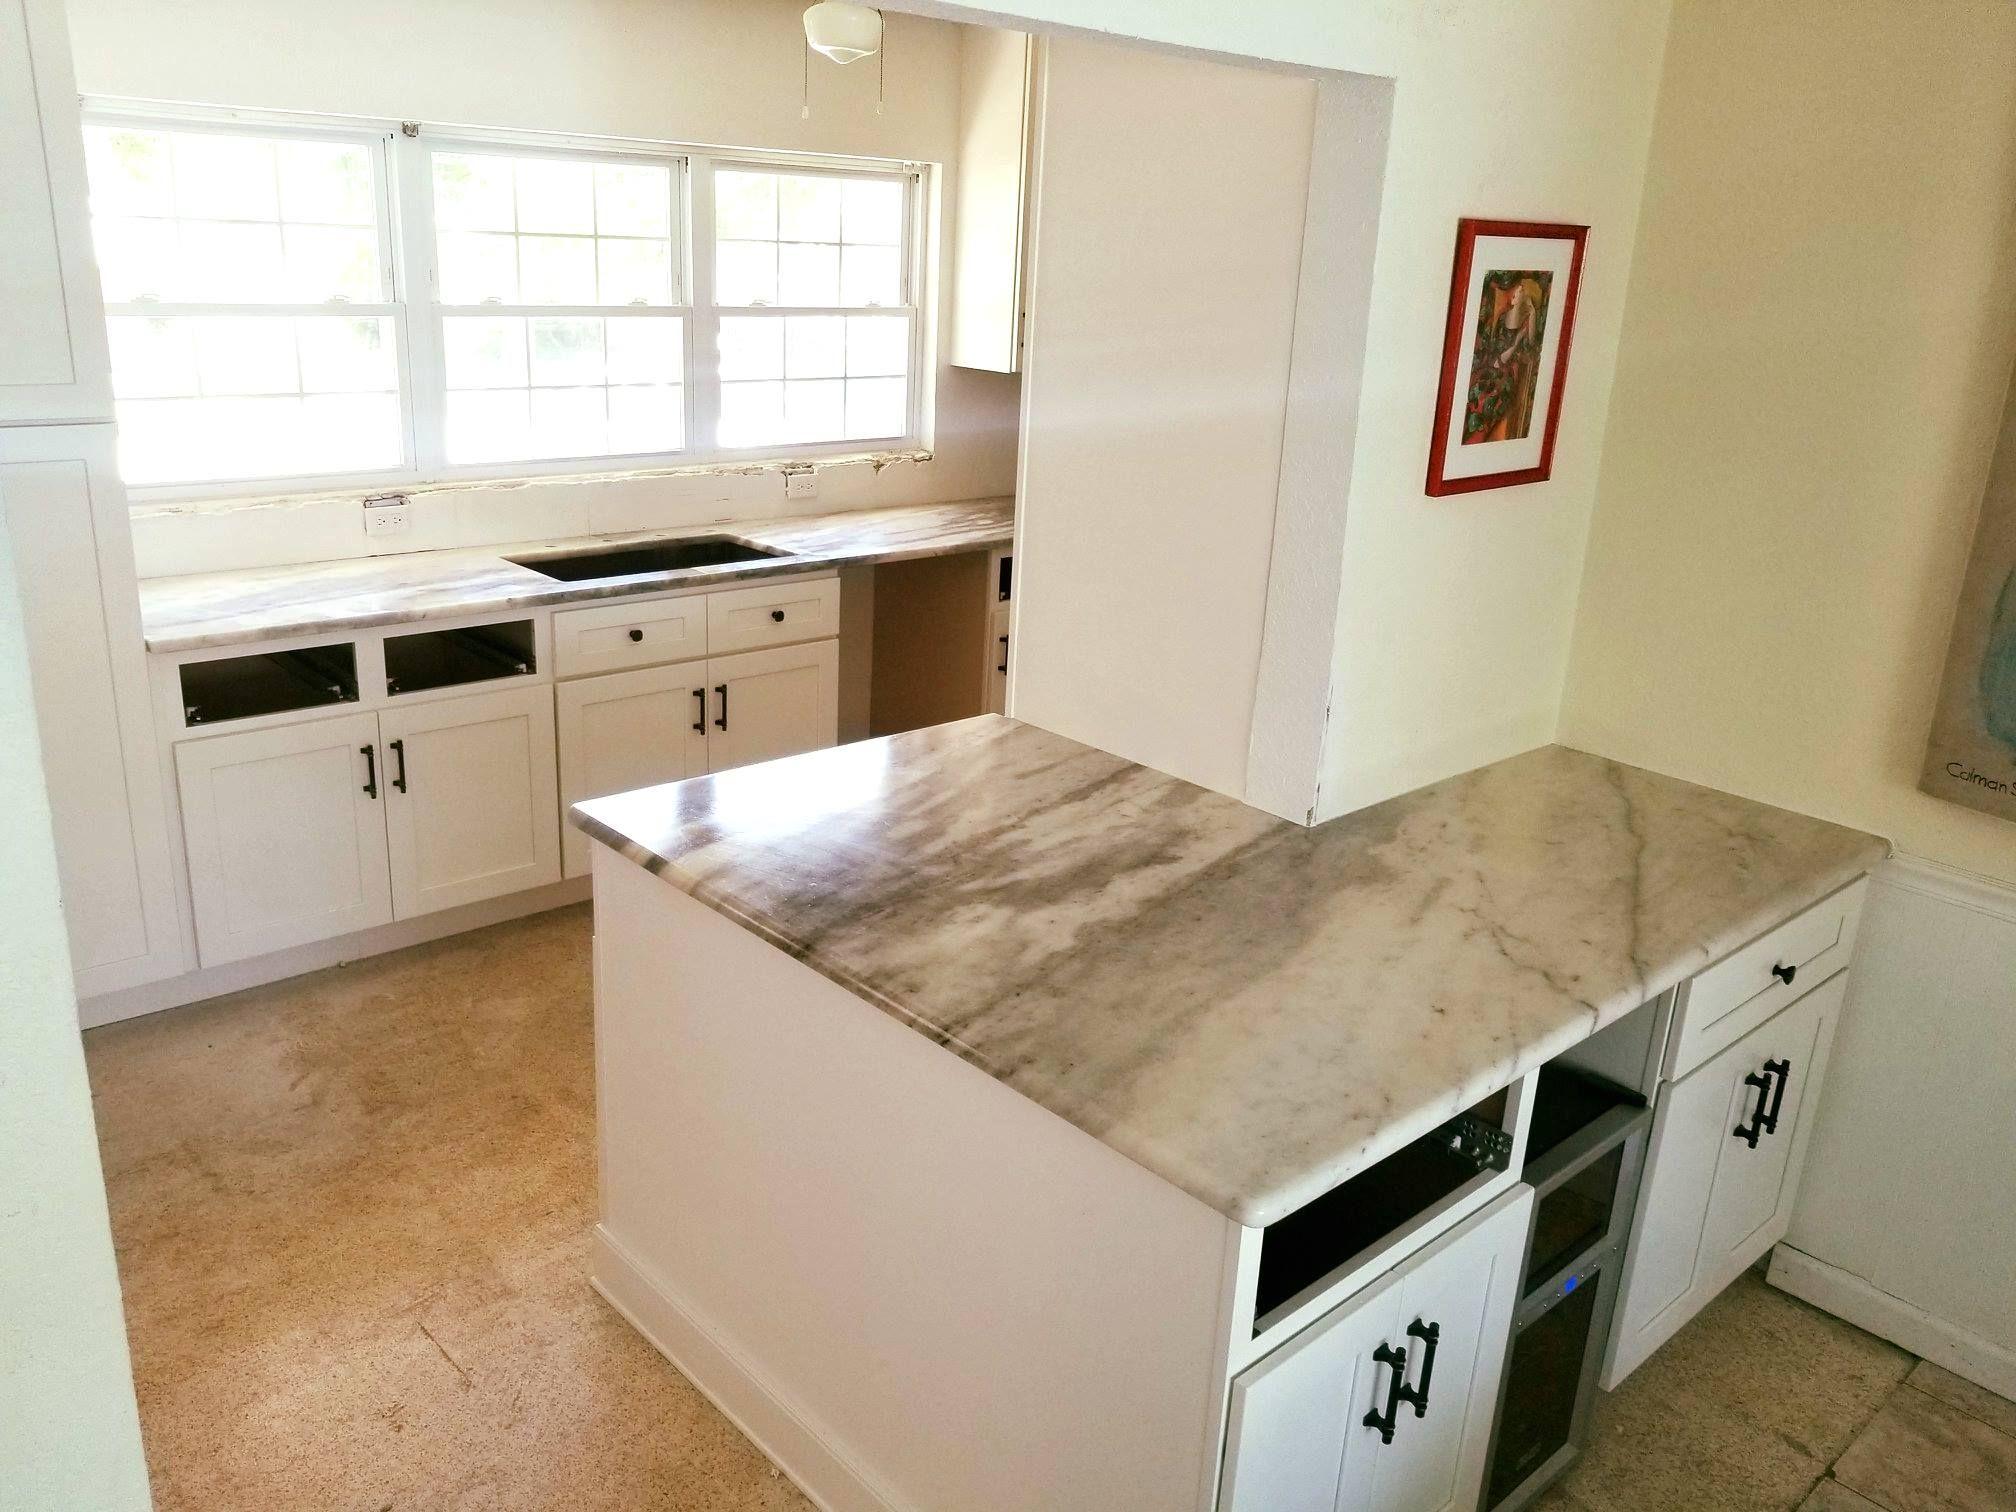 Custom Made Kitchen Countertop Using Astonishing White Ice Dolomite Designed Polished And Installe Countertops Natural Stone Countertops Kitchen Countertops